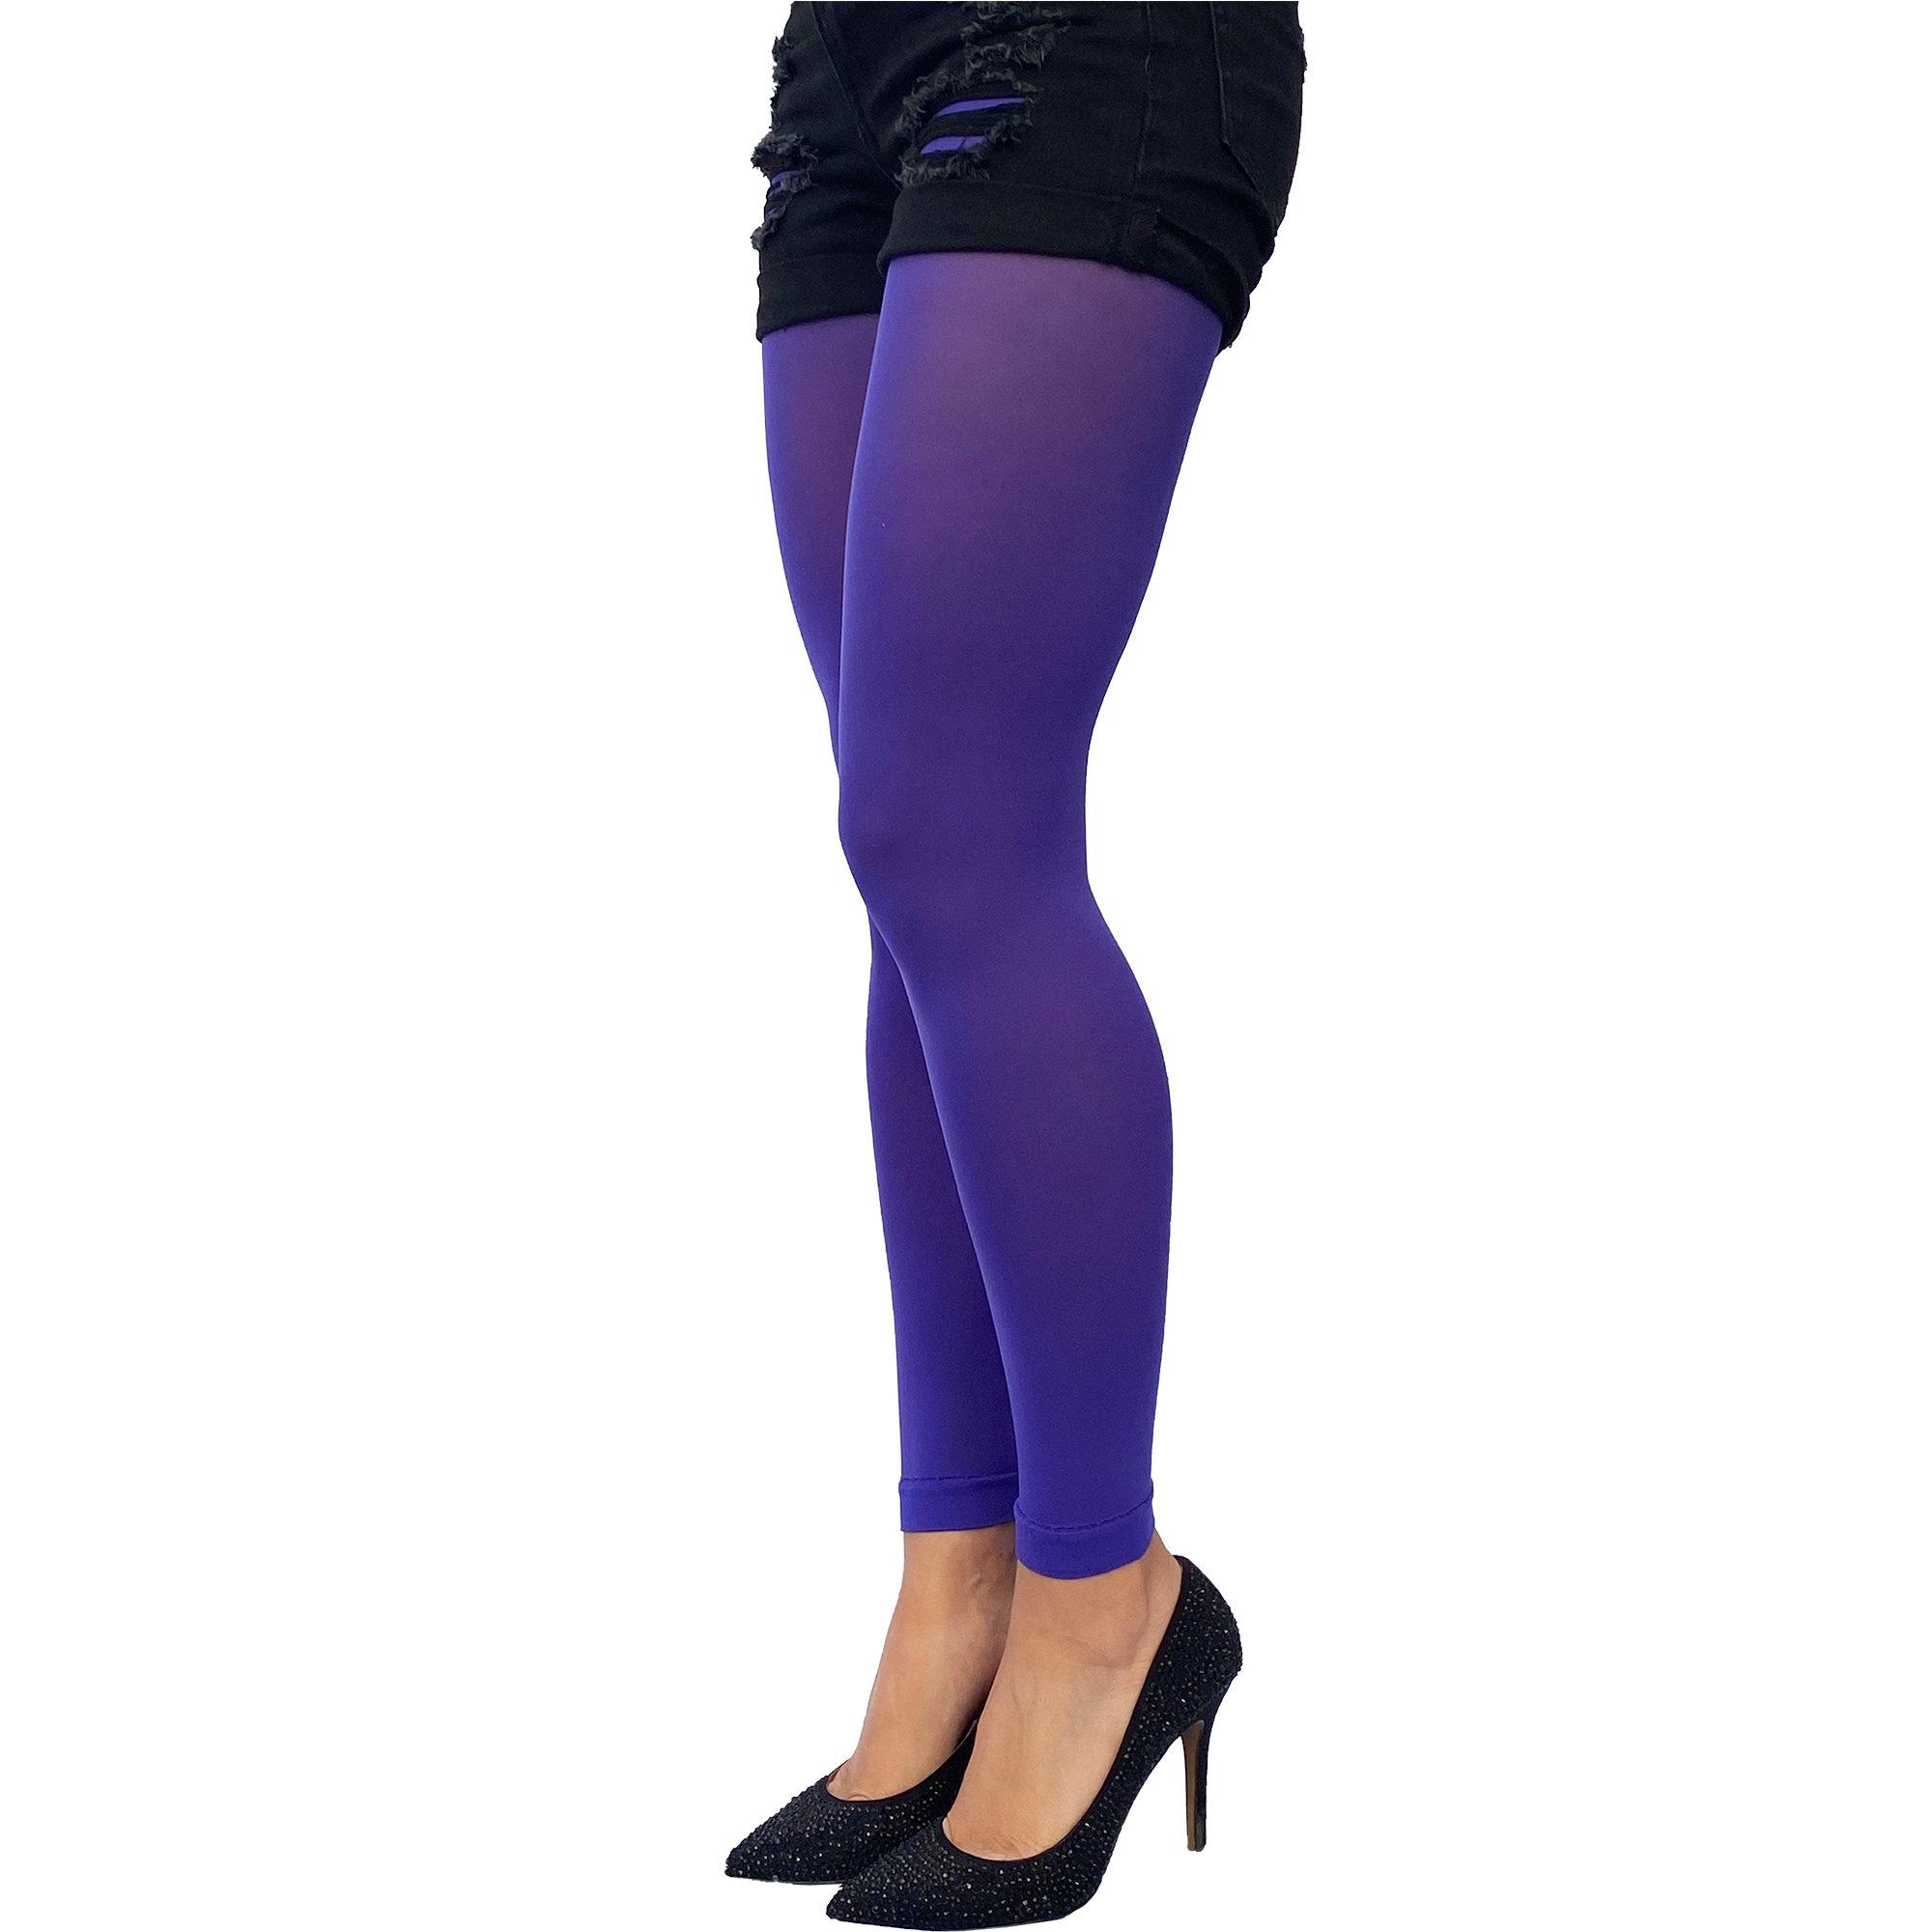 Footless Tights electric blue 50 deniers Malka Chic in smallmedium